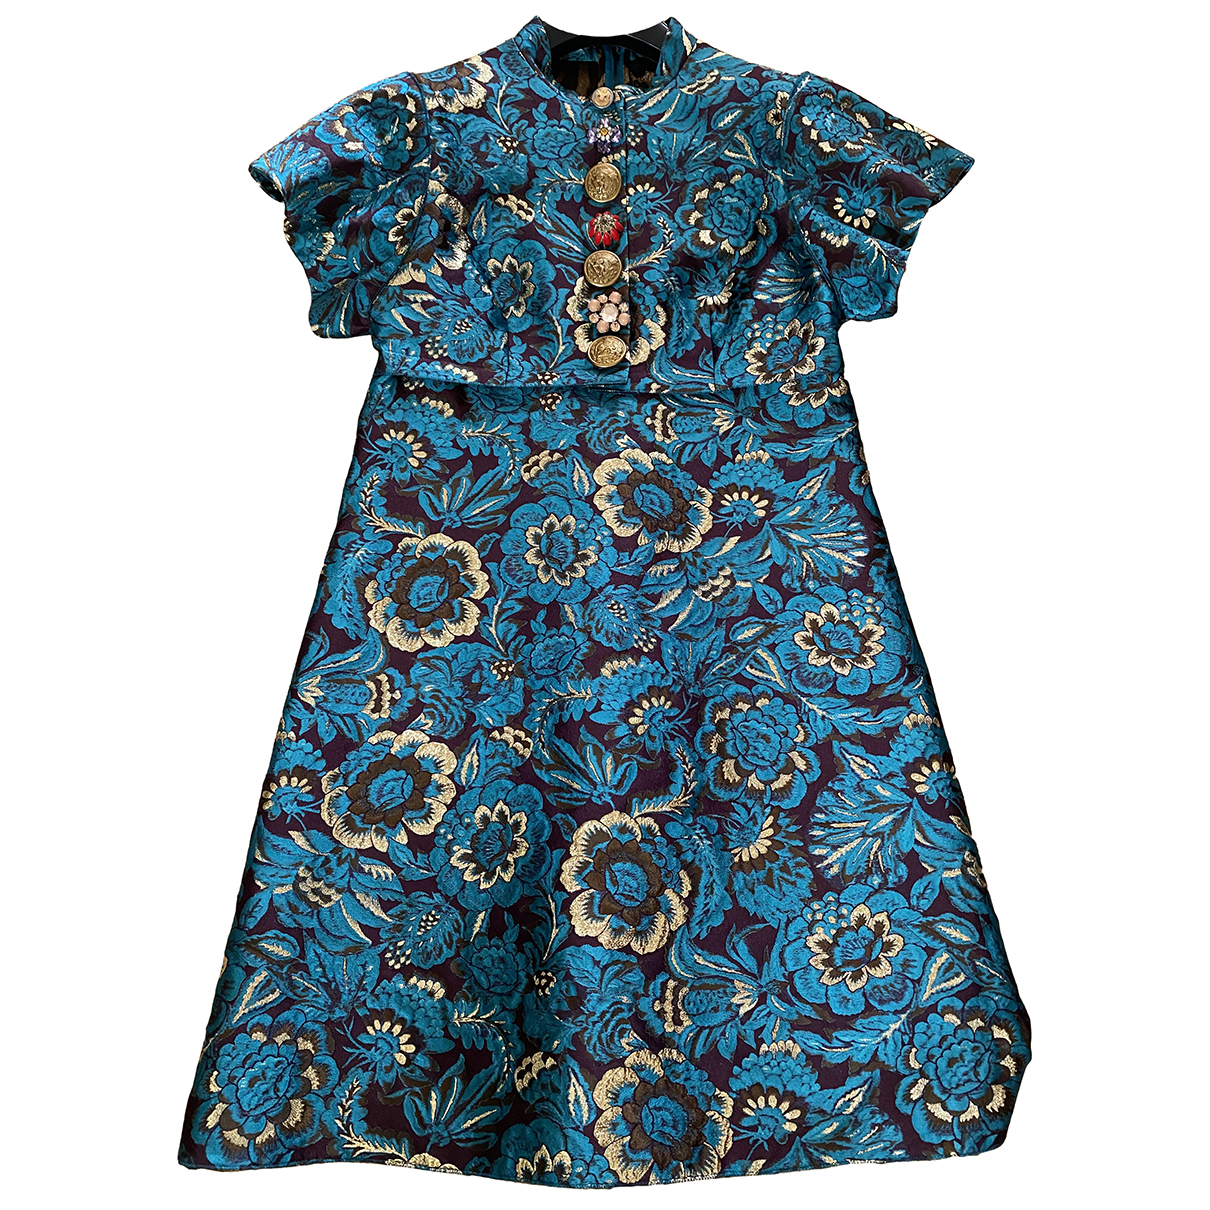 Dolce & Gabbana \N Kleid in  Blau Polyester